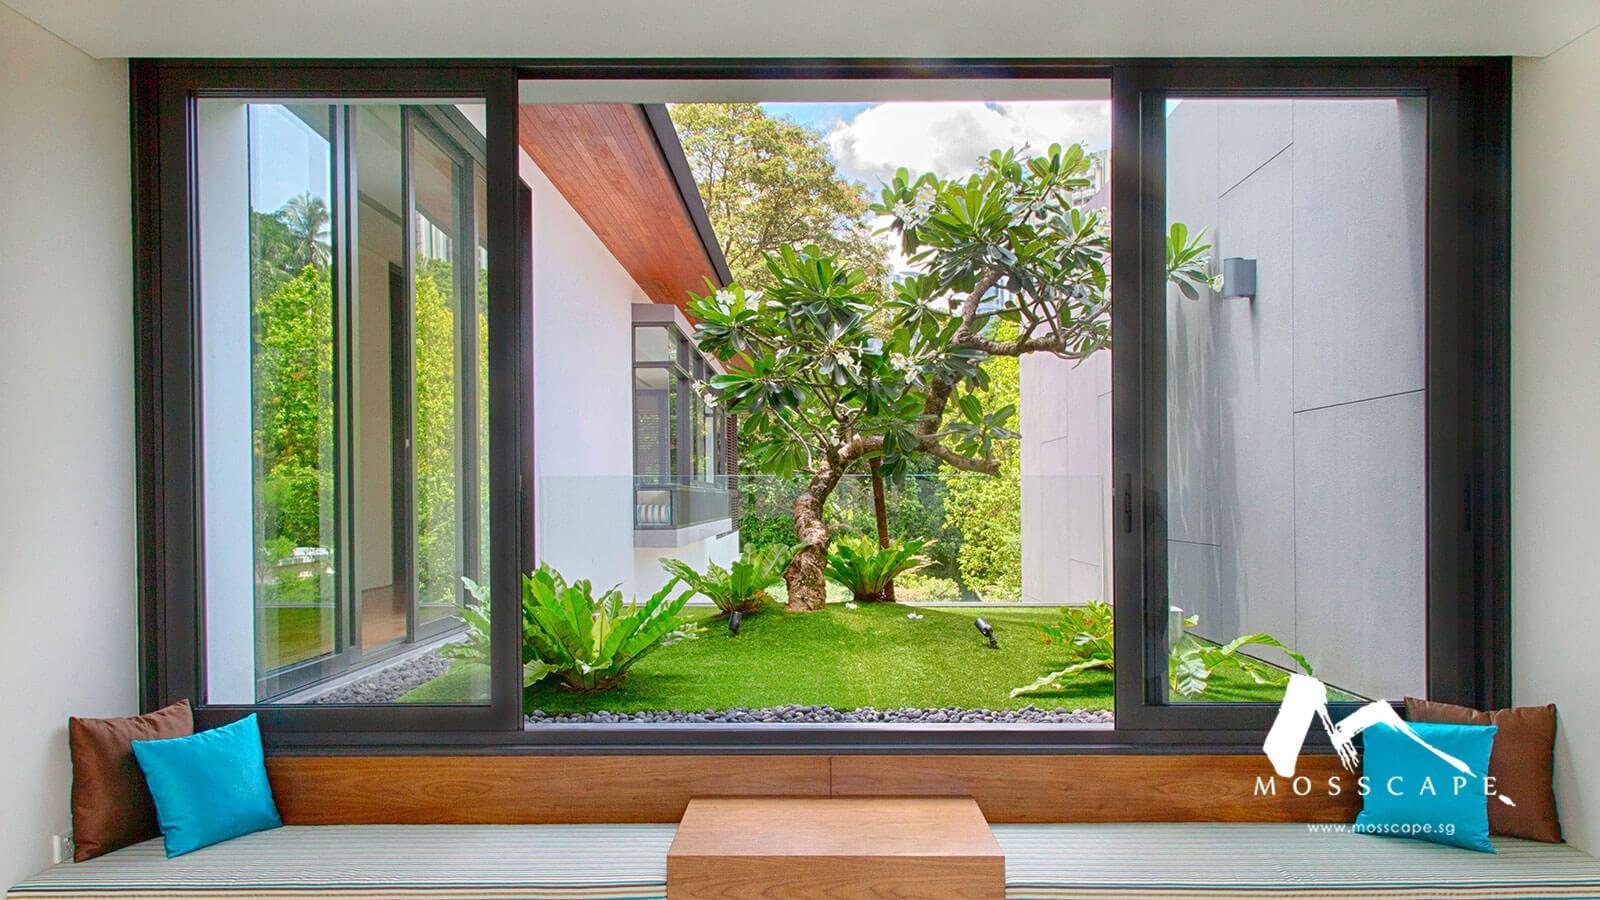 Soothing nature inspired interior design at Bishop Gate property